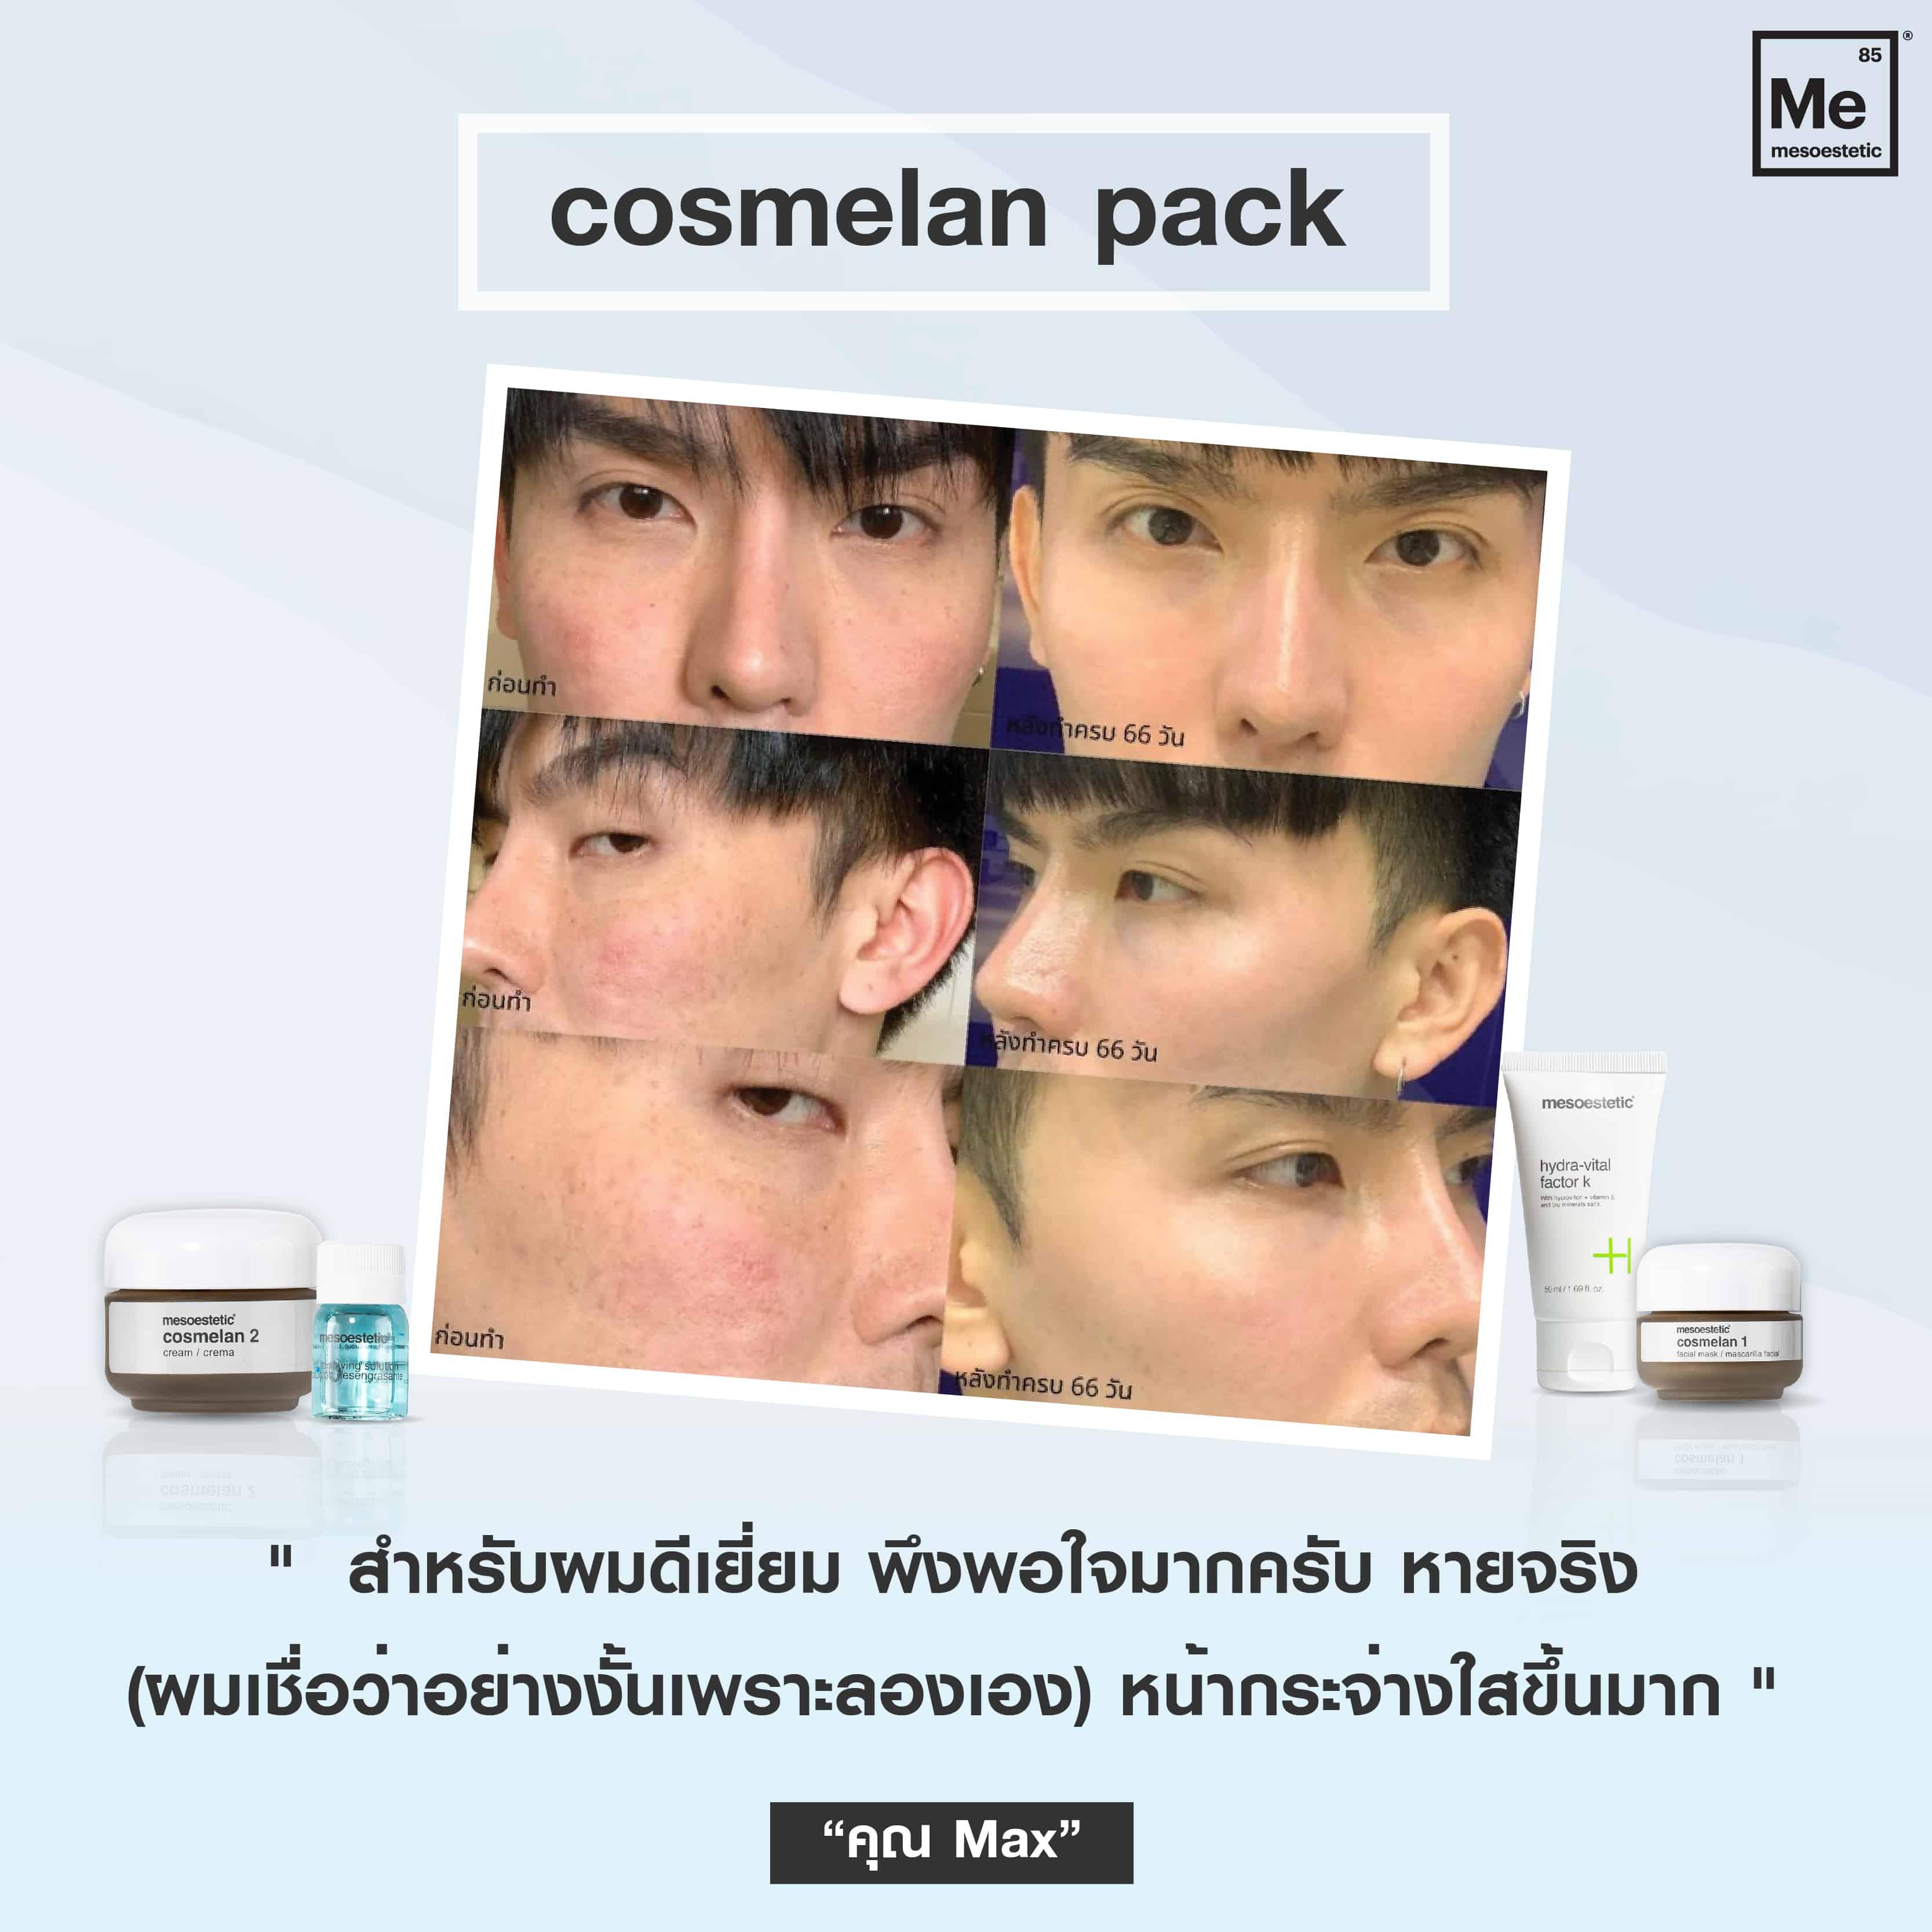 01 Review cosmelan-01